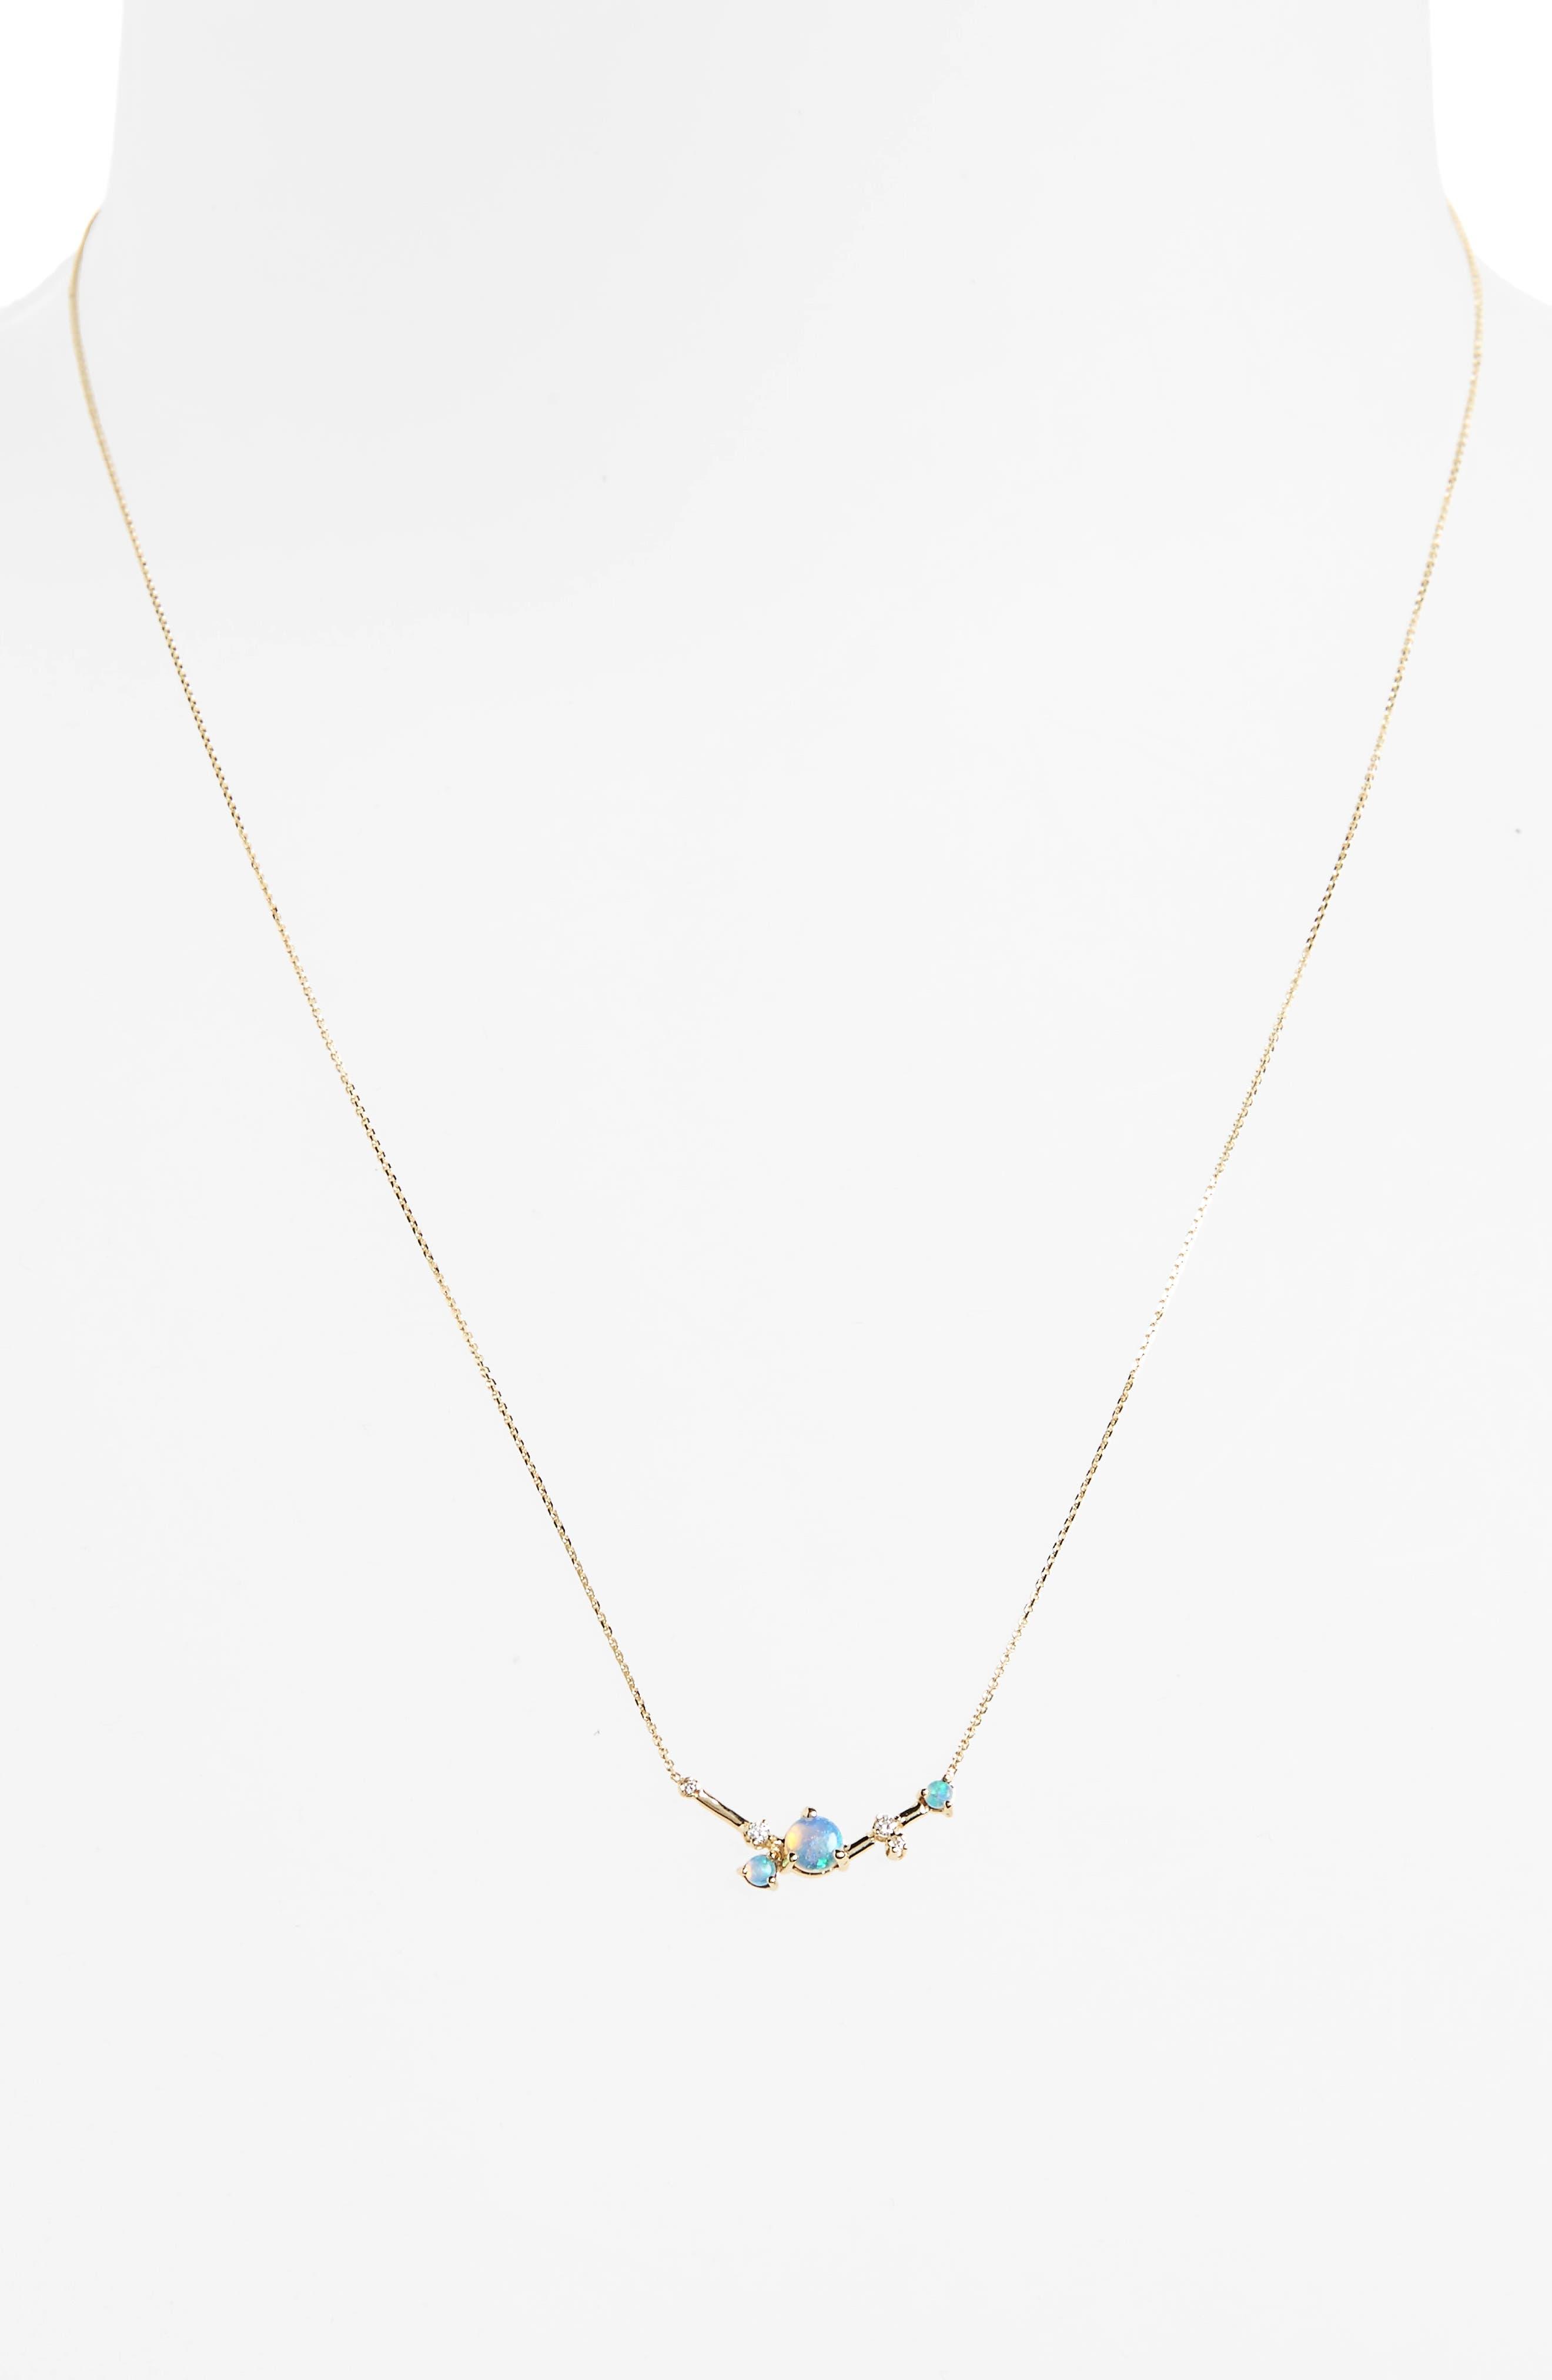 Organic Triangle Opal & Diamond Necklace,                             Alternate thumbnail 2, color,                             WHITE DIAMOND/ GOLD